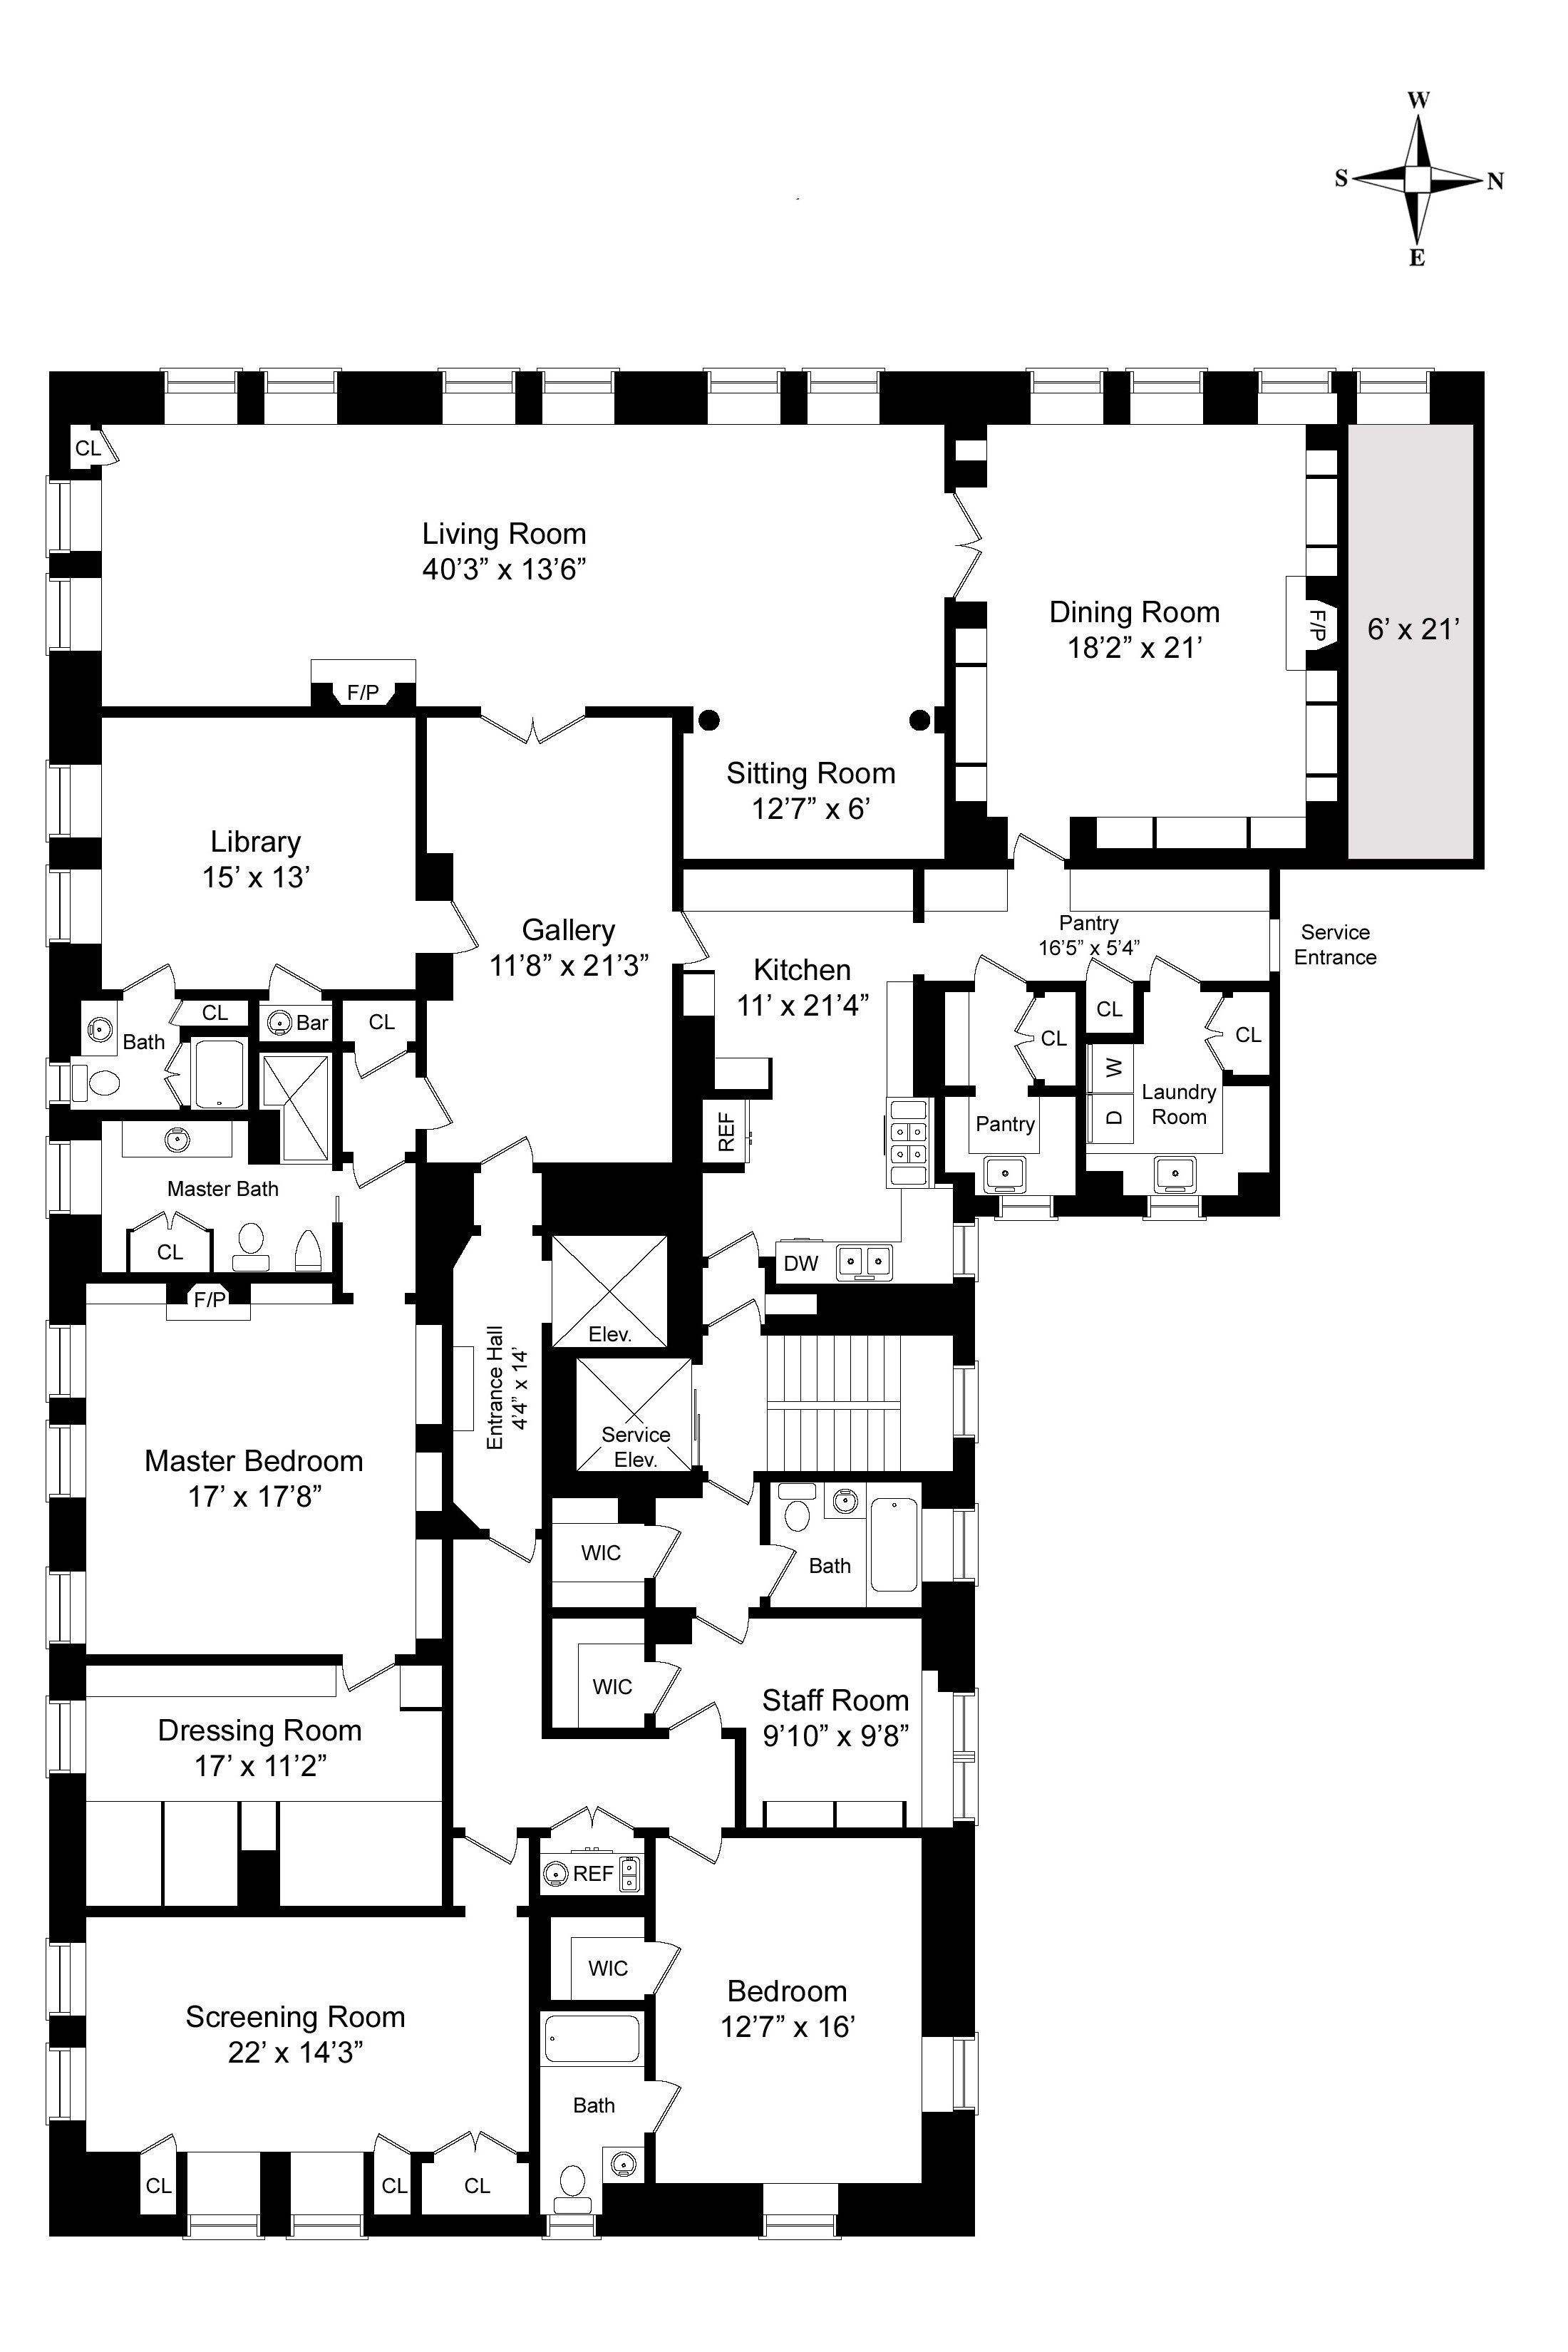 Floorplan For Howard Slatkin Fifth Avenue Apartment Condo Floor Plans Apartment Floor Plans House Floor Plans